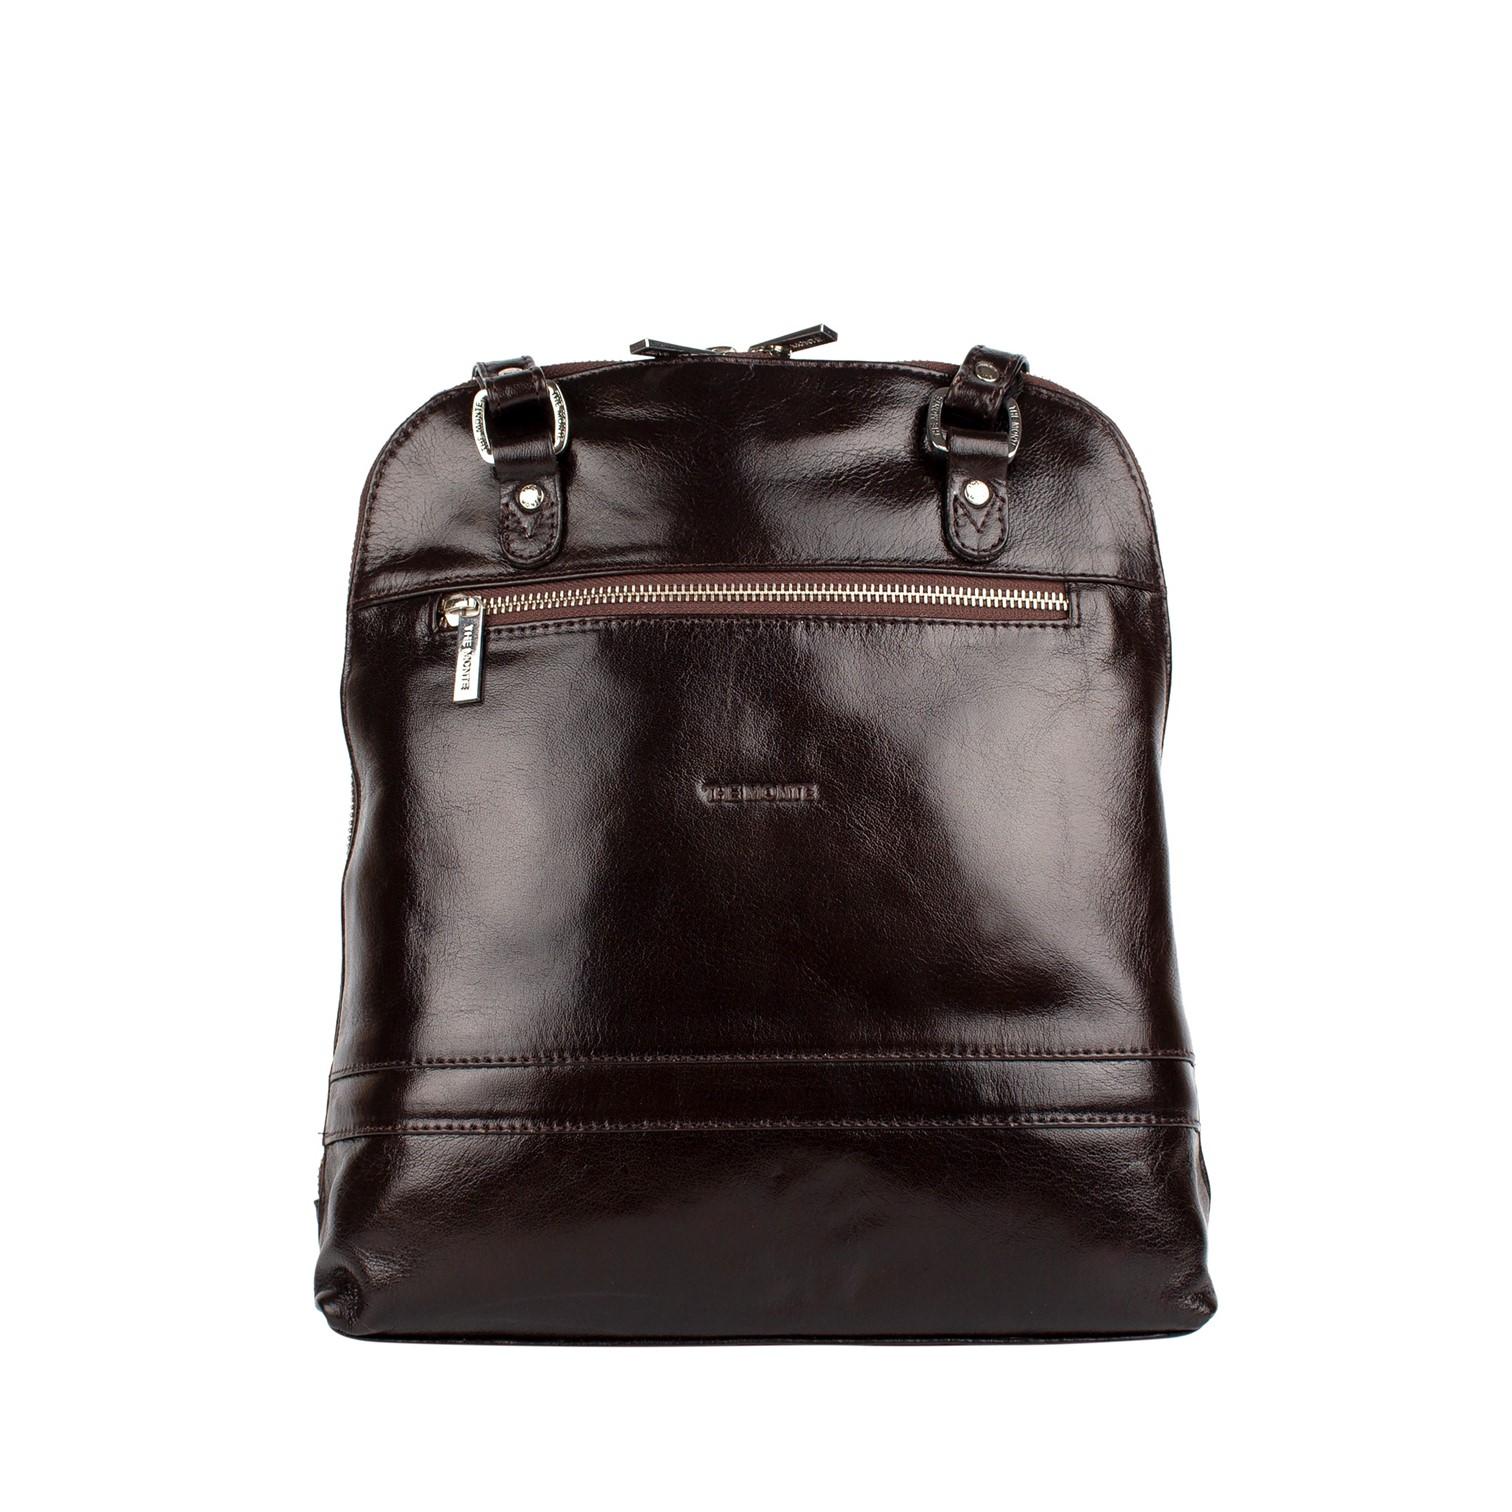 RYGGSÄCKAR Adriatik Travel Bag